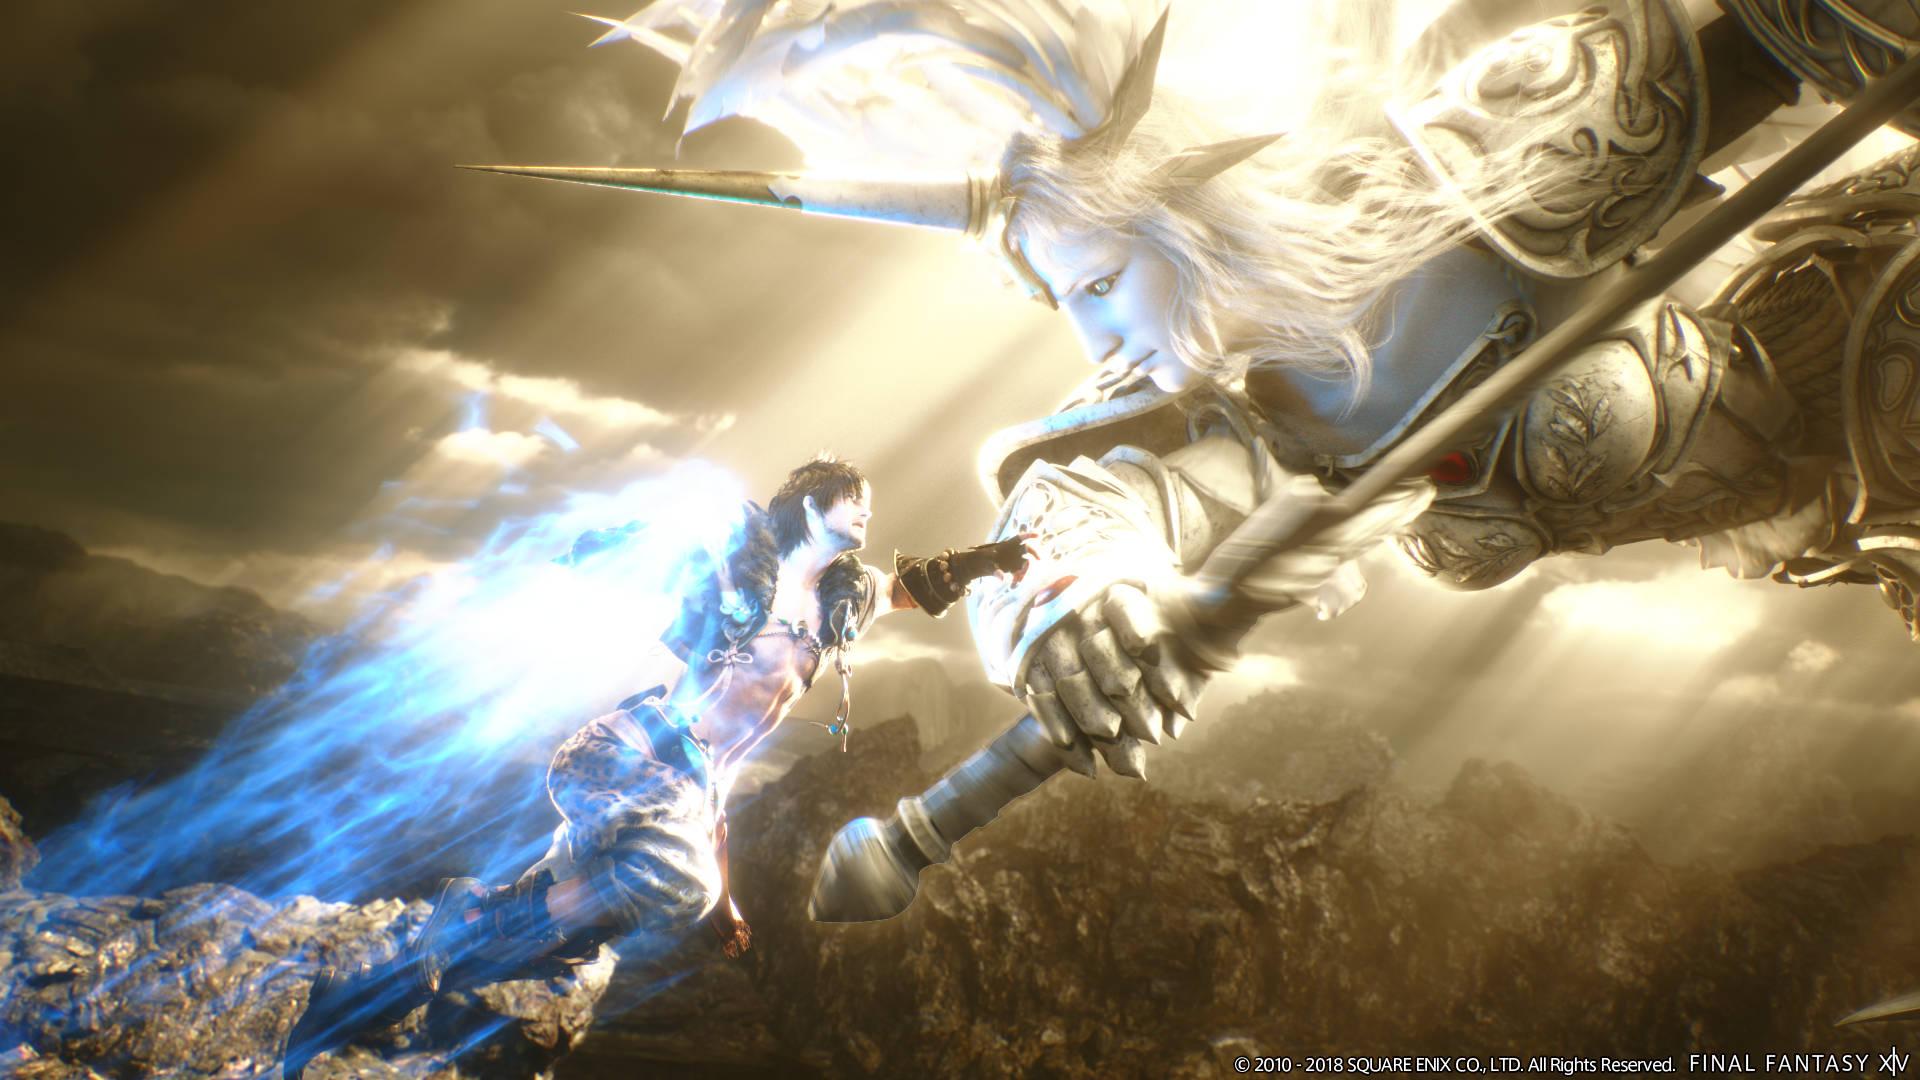 Let's Predict the New Final Fantasy XIV: Shadowbringers ...